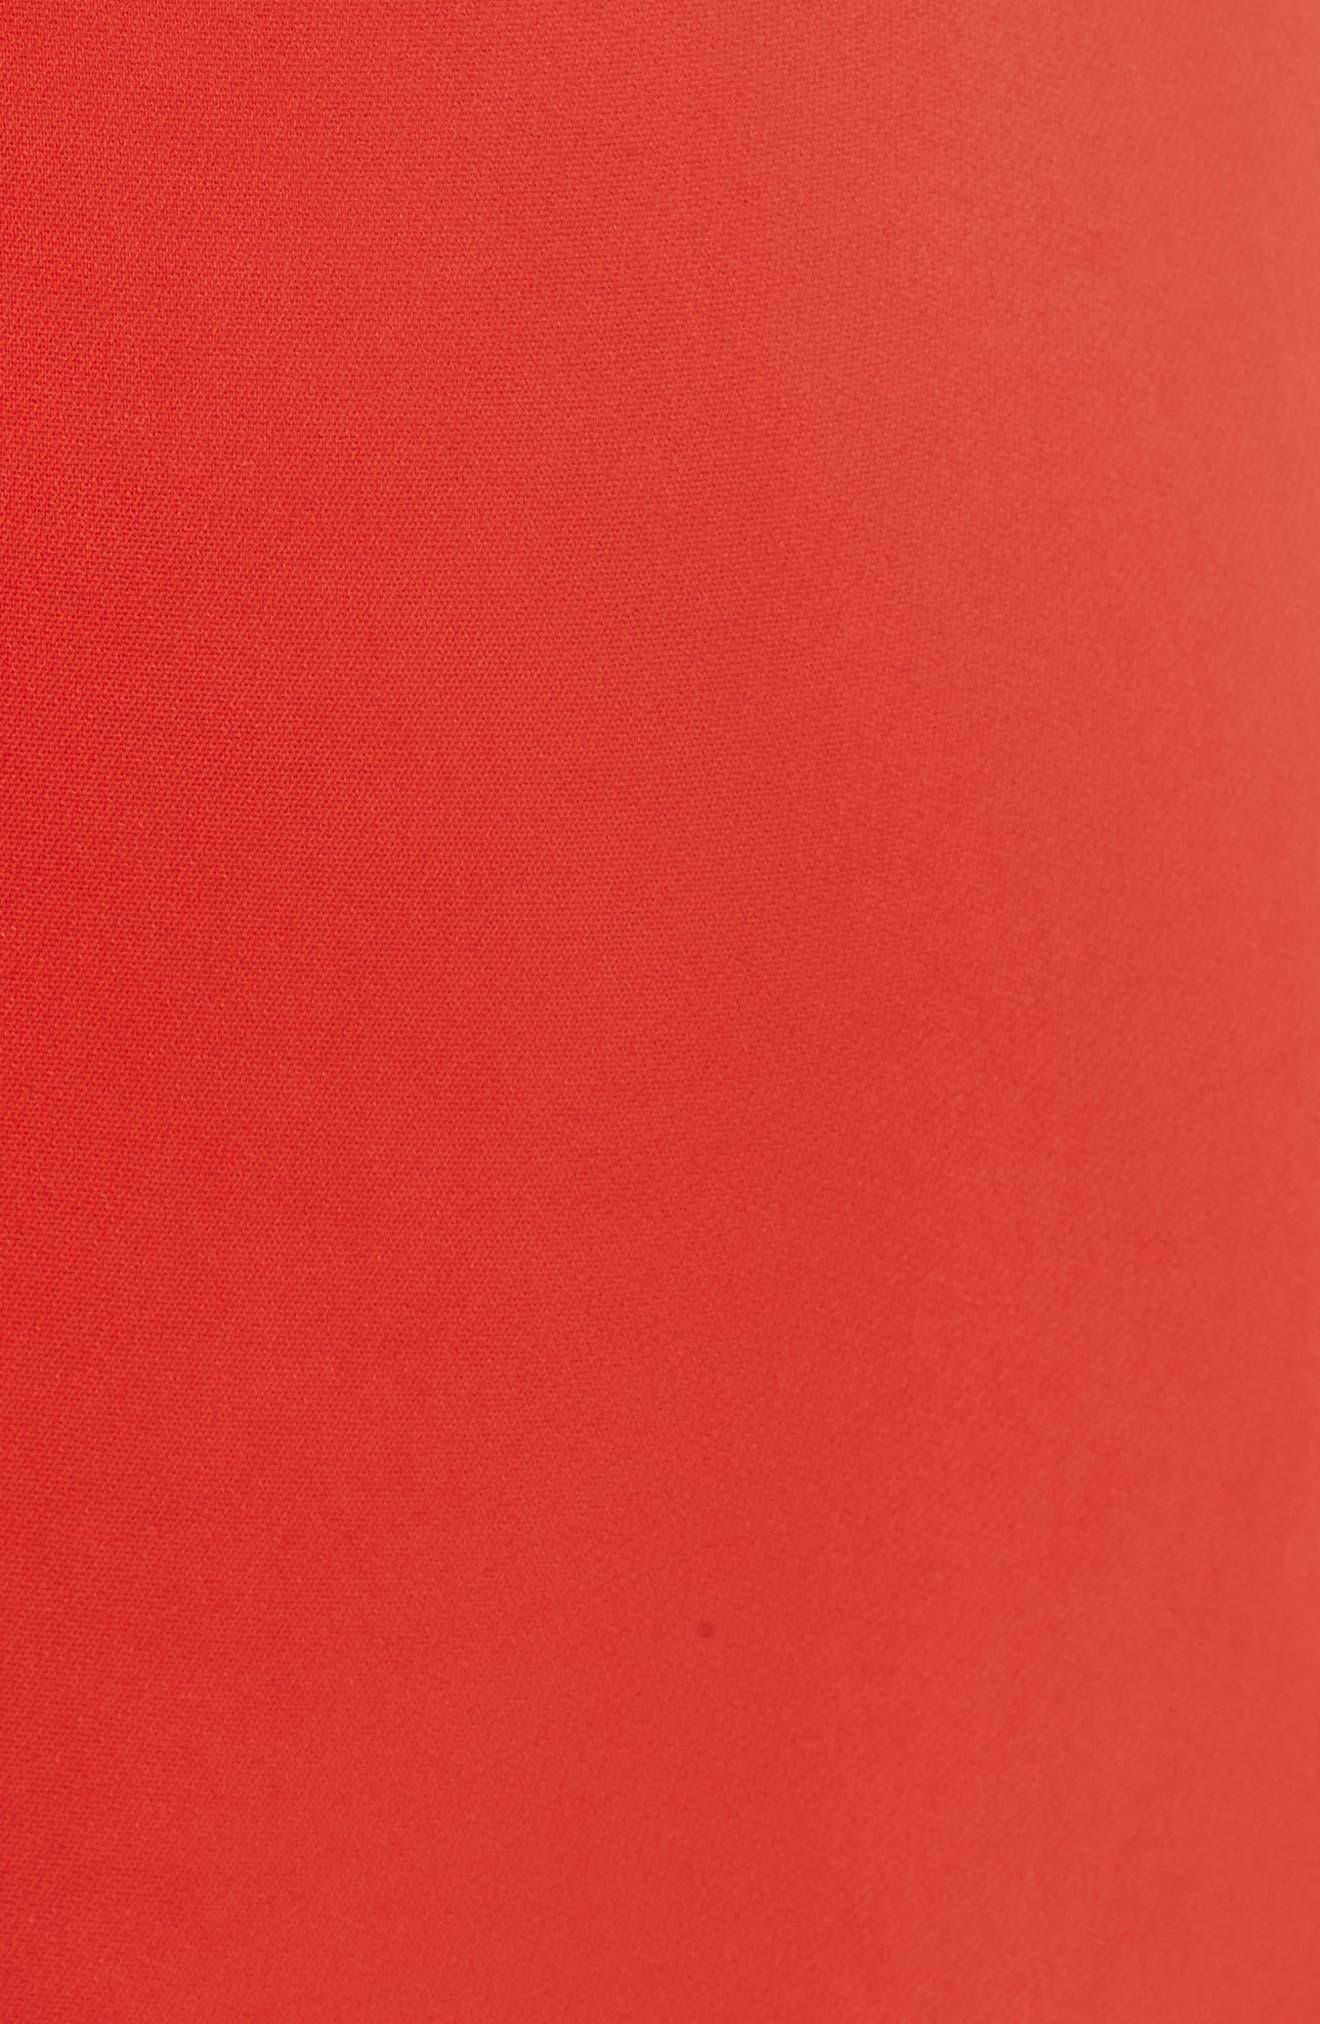 Bow Back Asymmetrical Dress,                             Alternate thumbnail 6, color,                             Red